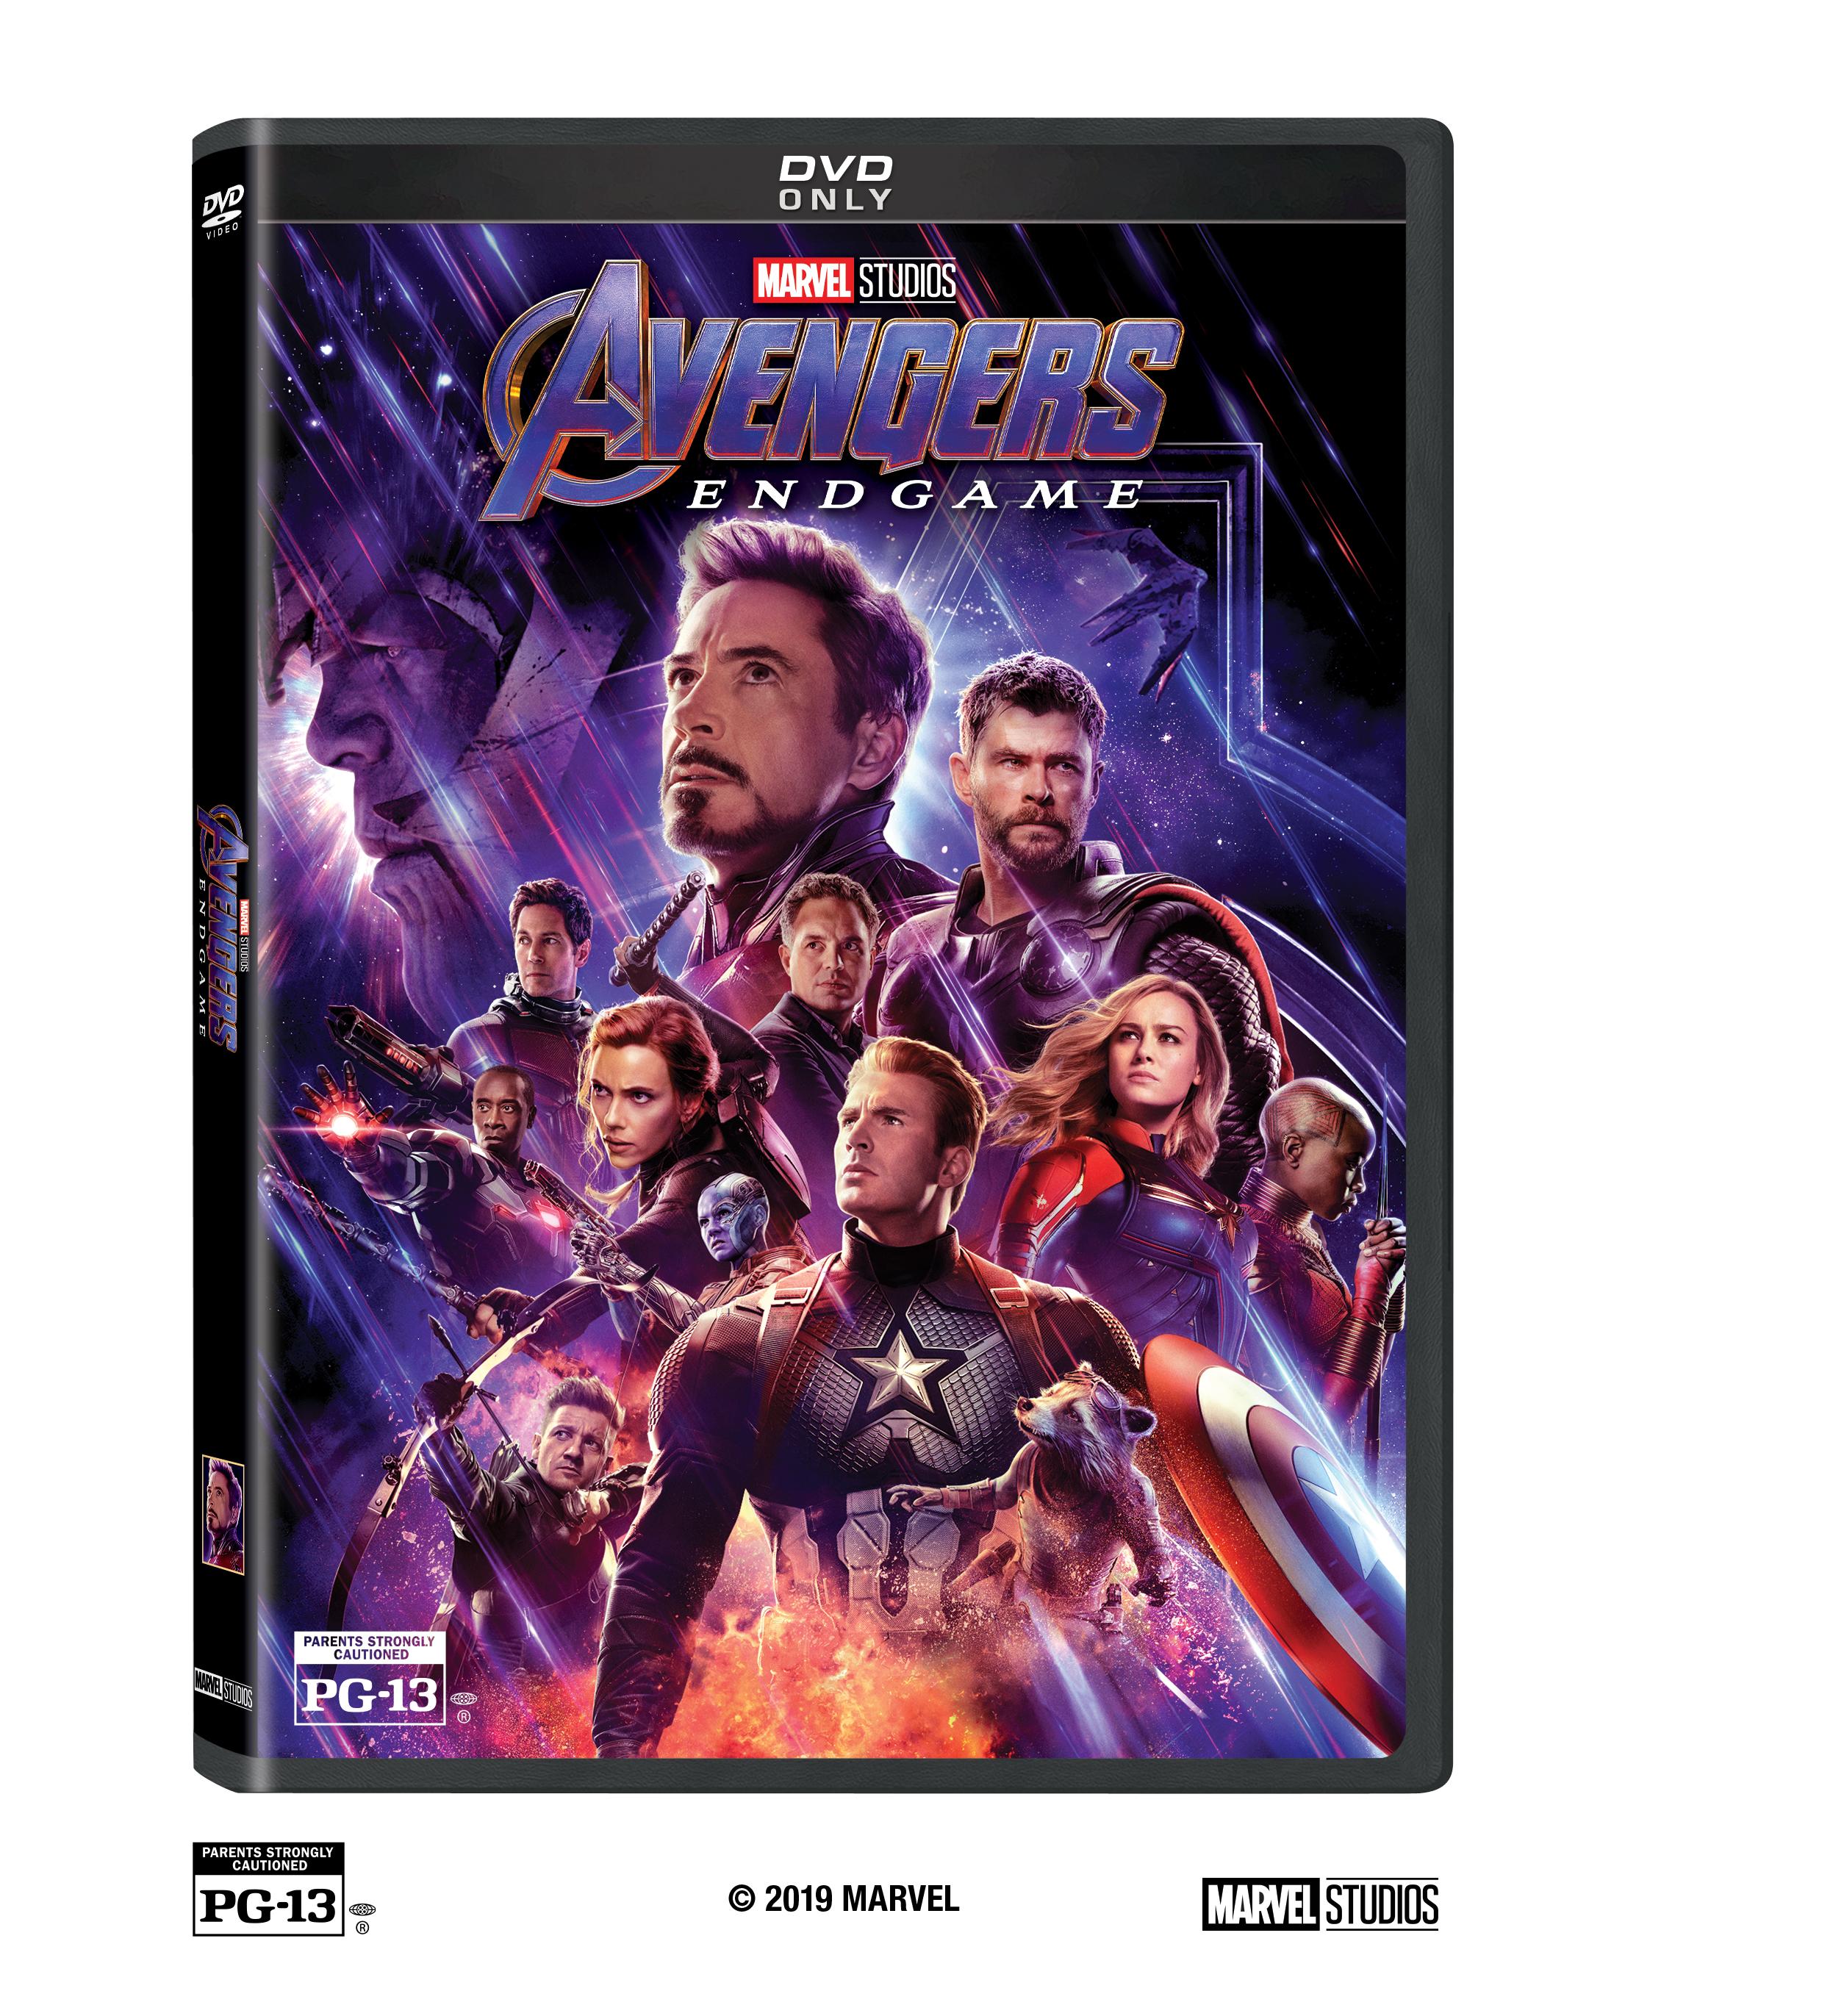 Marvel Studios Avengers: Endgame Releases On Digital July 30 And On Blu Ray Aug 13